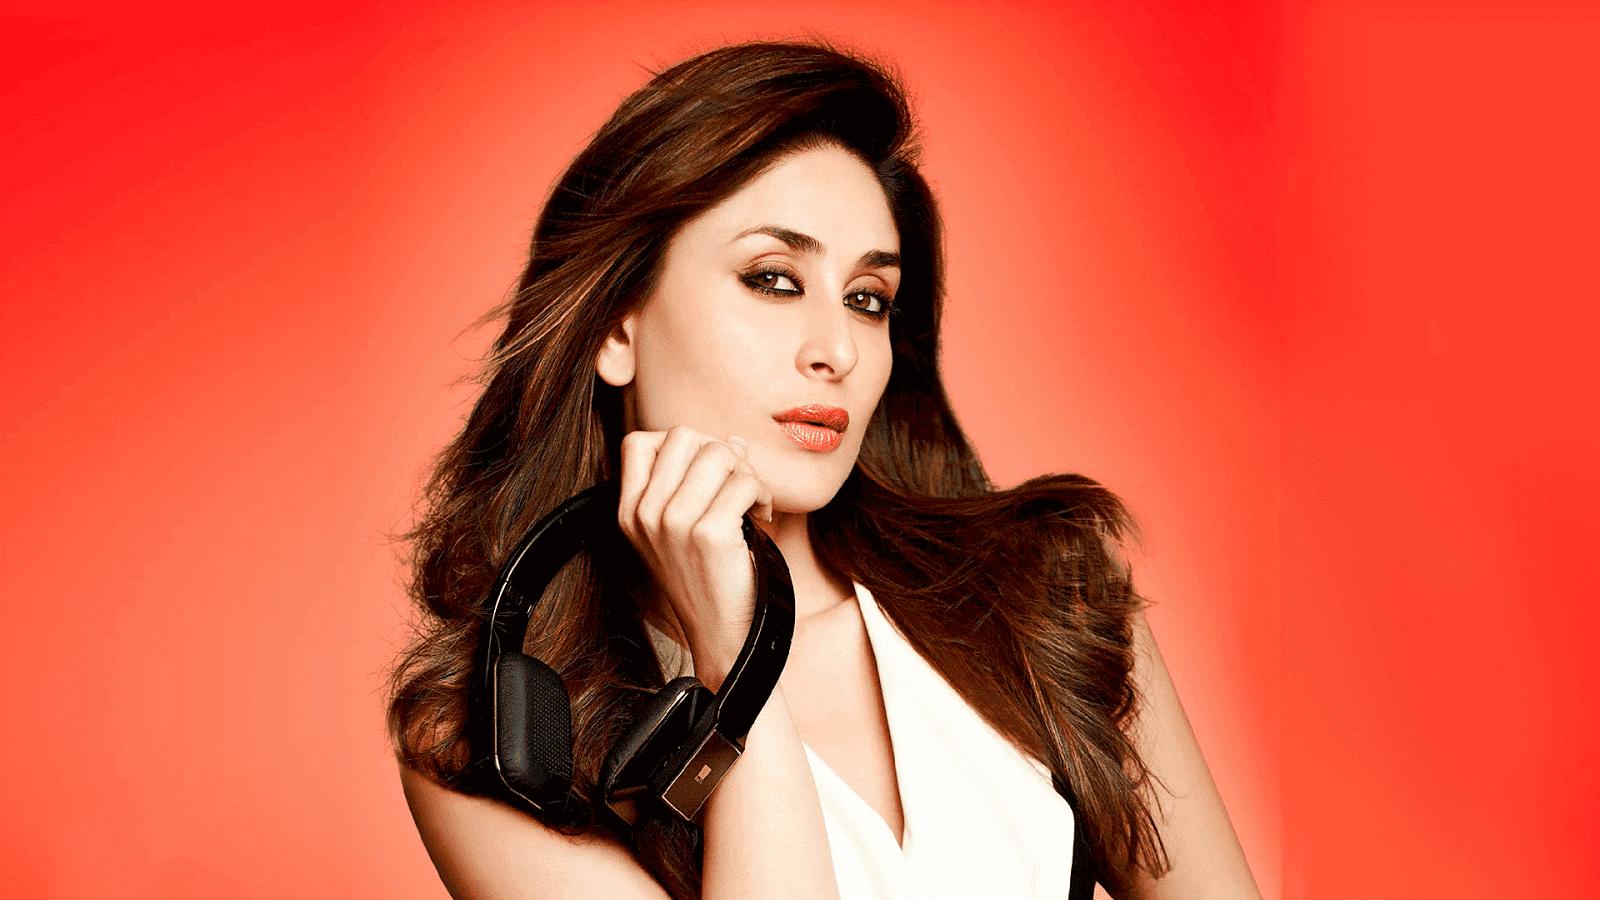 Kareena Kapoor Khan Wallpapers Hd Download Free 1080P -3846